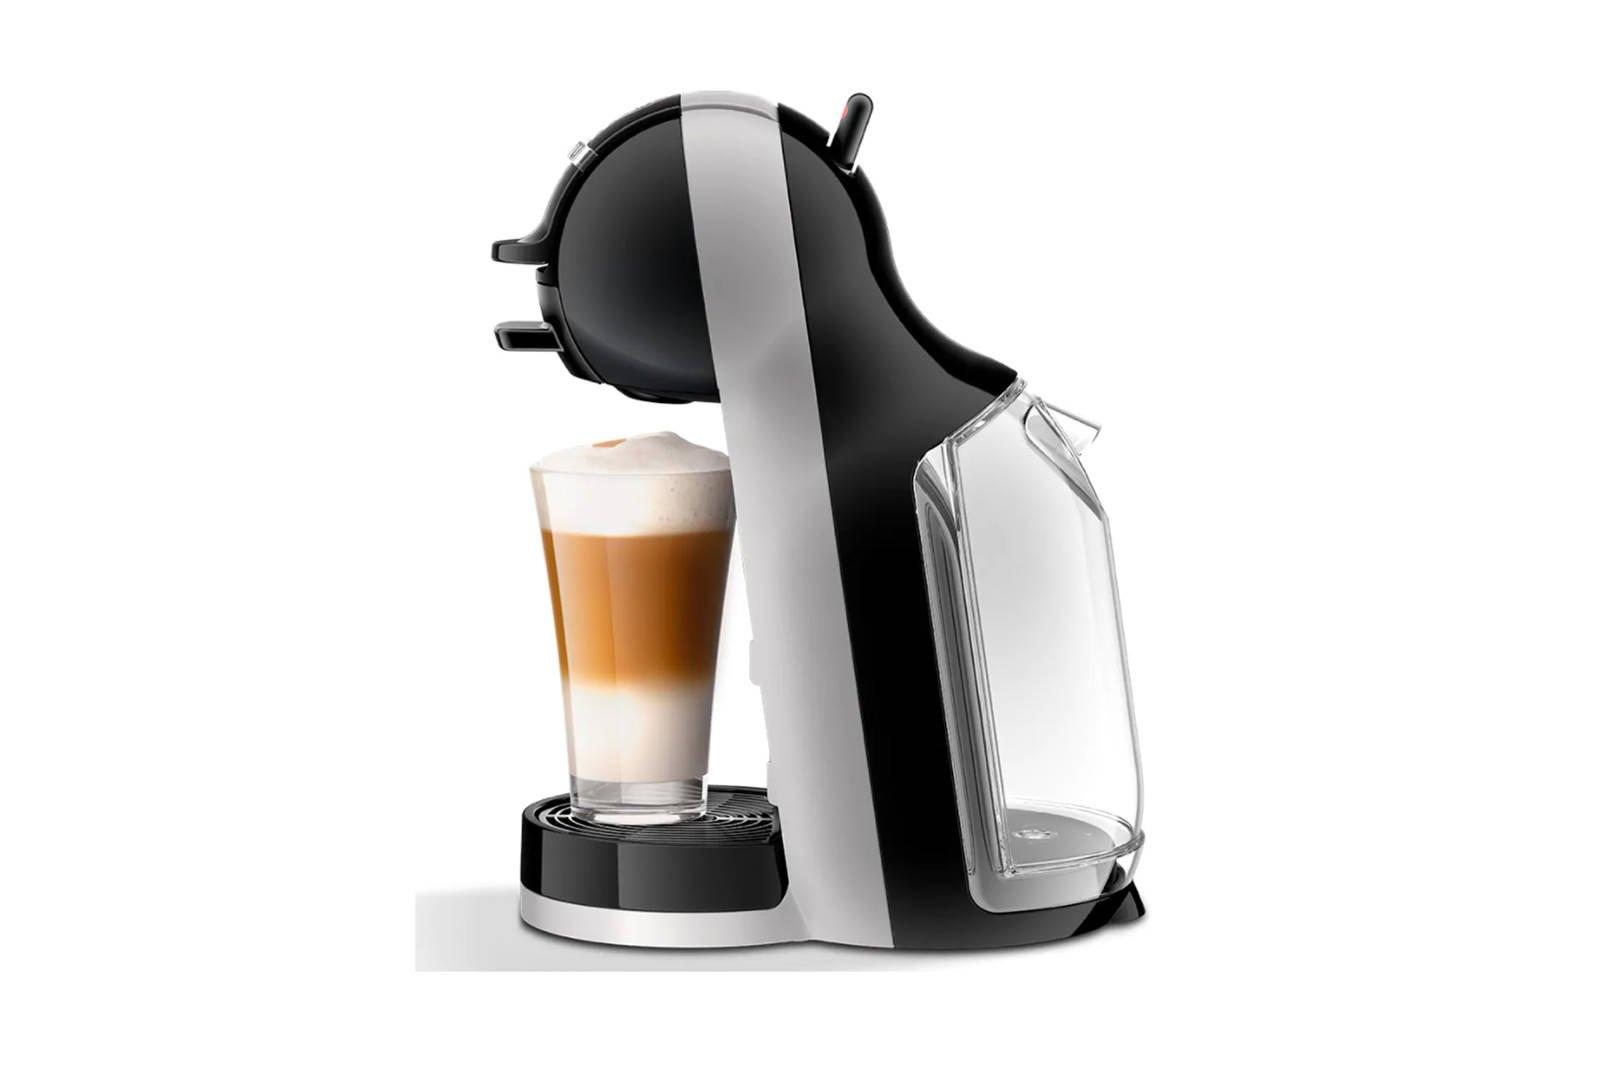 Capsule coffee machine NESCAFÉ Dolce Gusto by De'Longhi Mini Me EDG155.BG